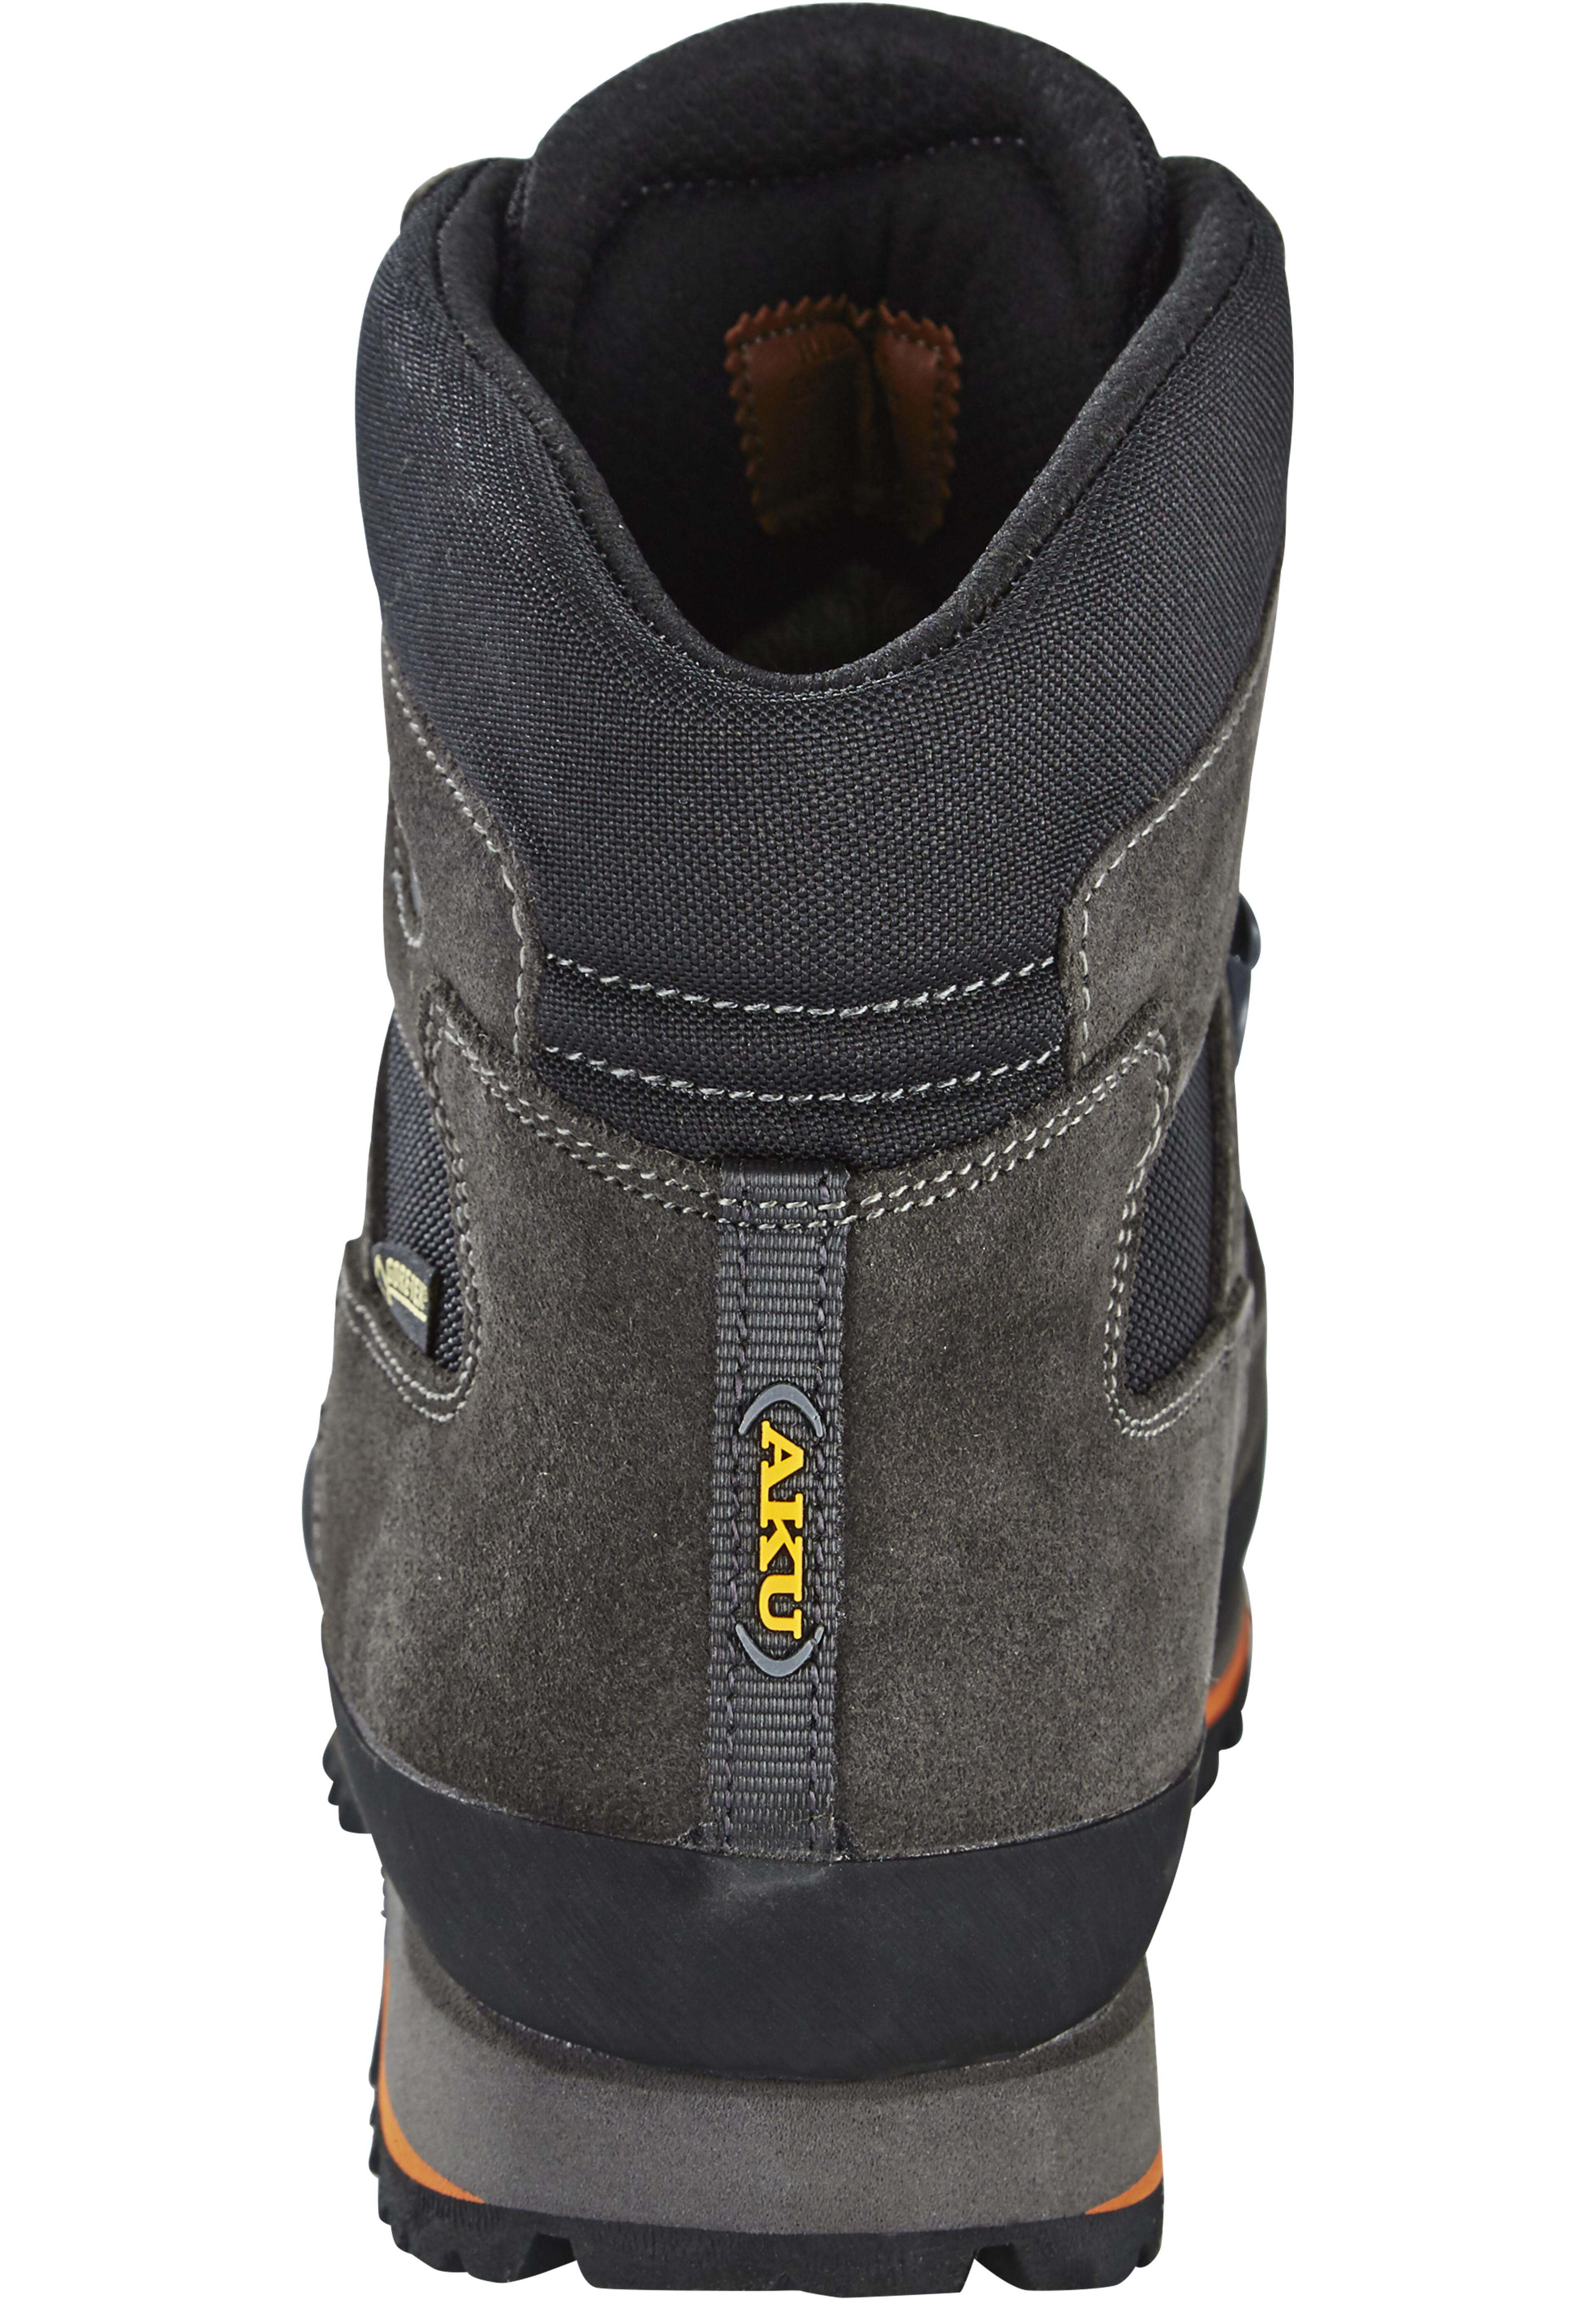 26557989648b0 AKU Conero Scarpe Uomo Shoes Men grigio nero su Addnature